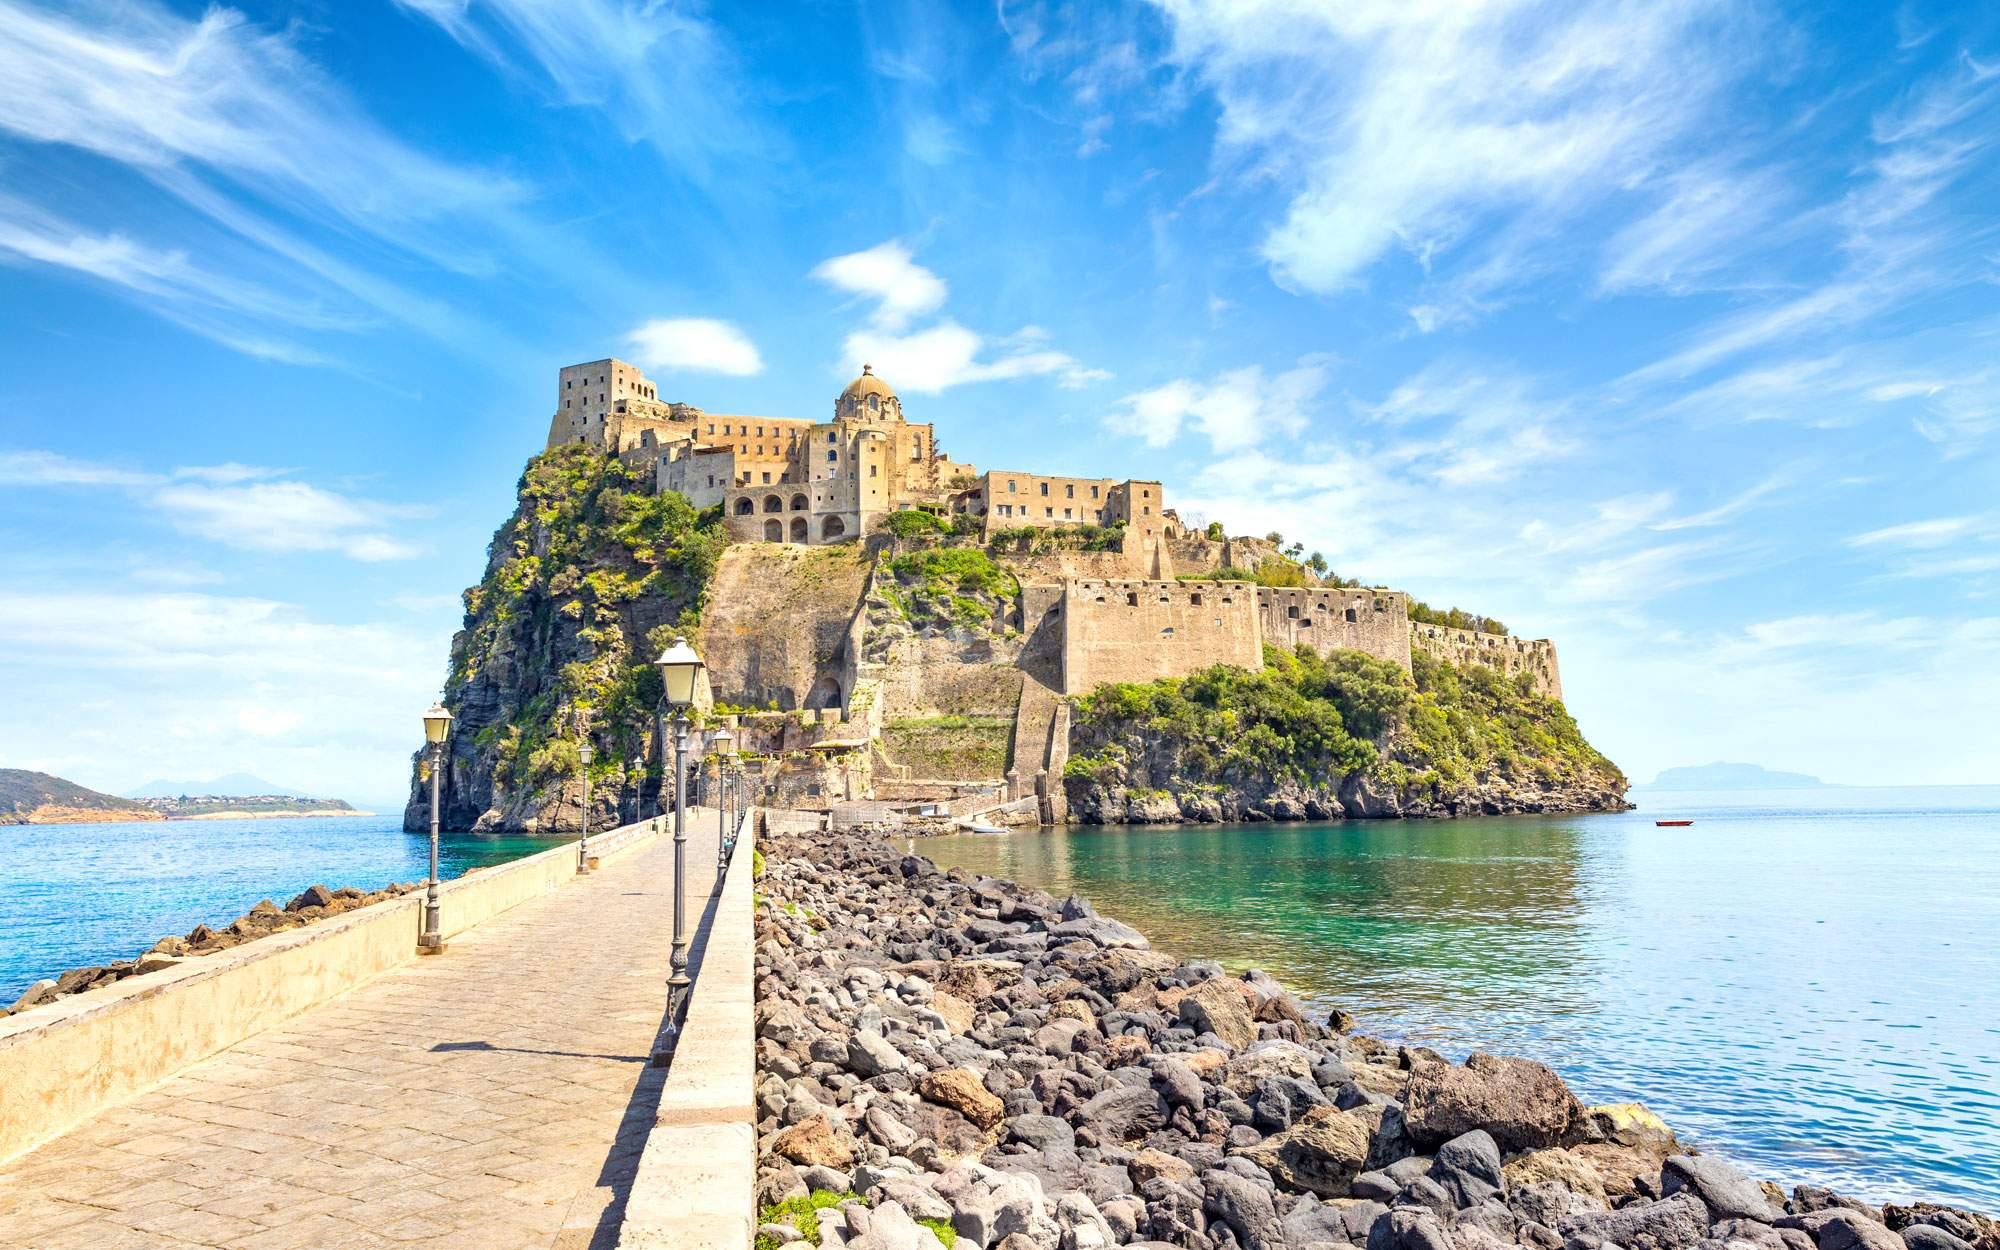 castello-aragonese-italy-naples-amalfi-castle